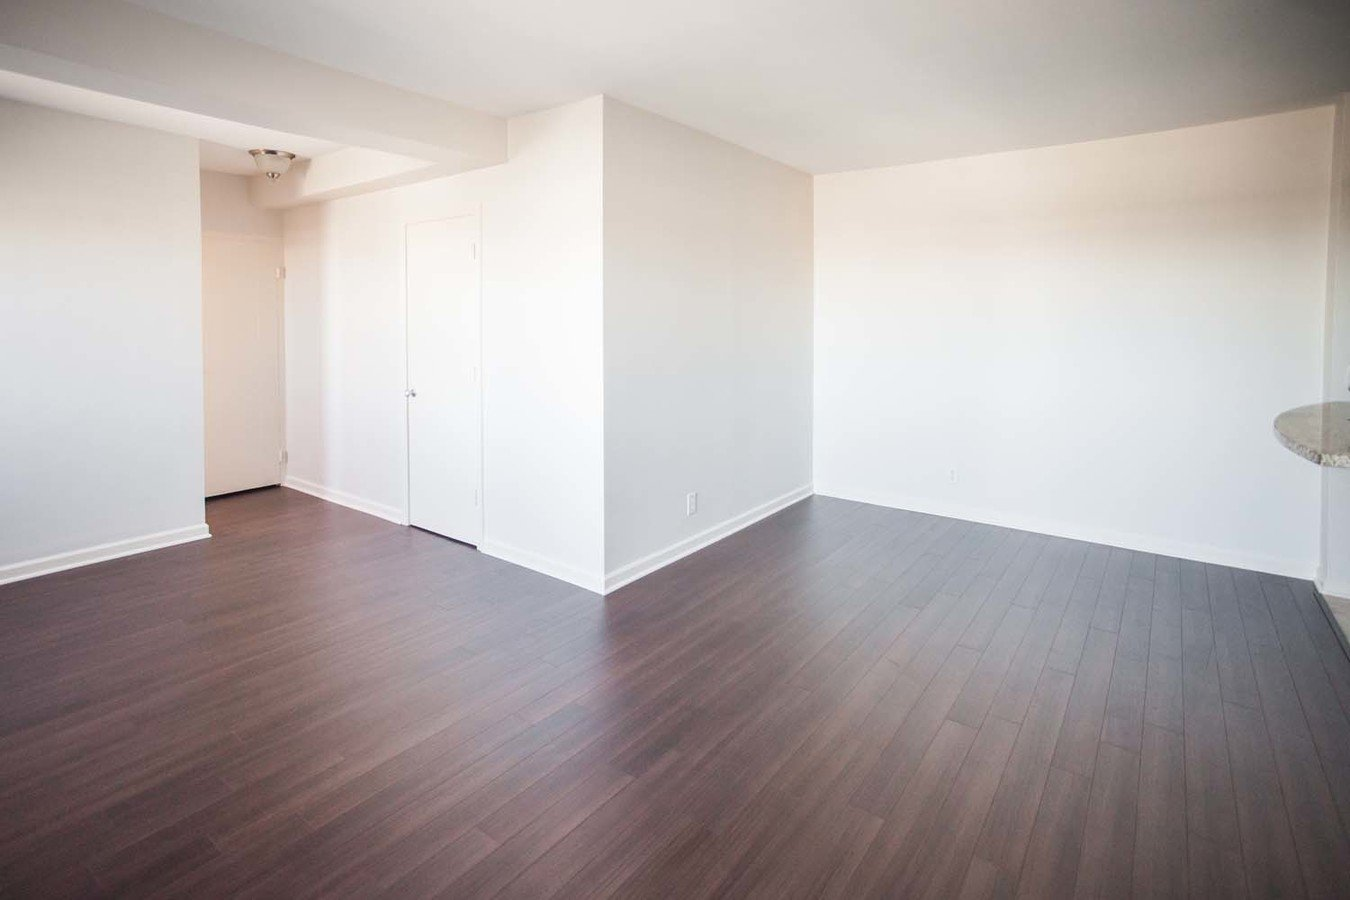 Studio 1 Bathroom Apartment for rent at Parc Frontenac in St Louis, MO